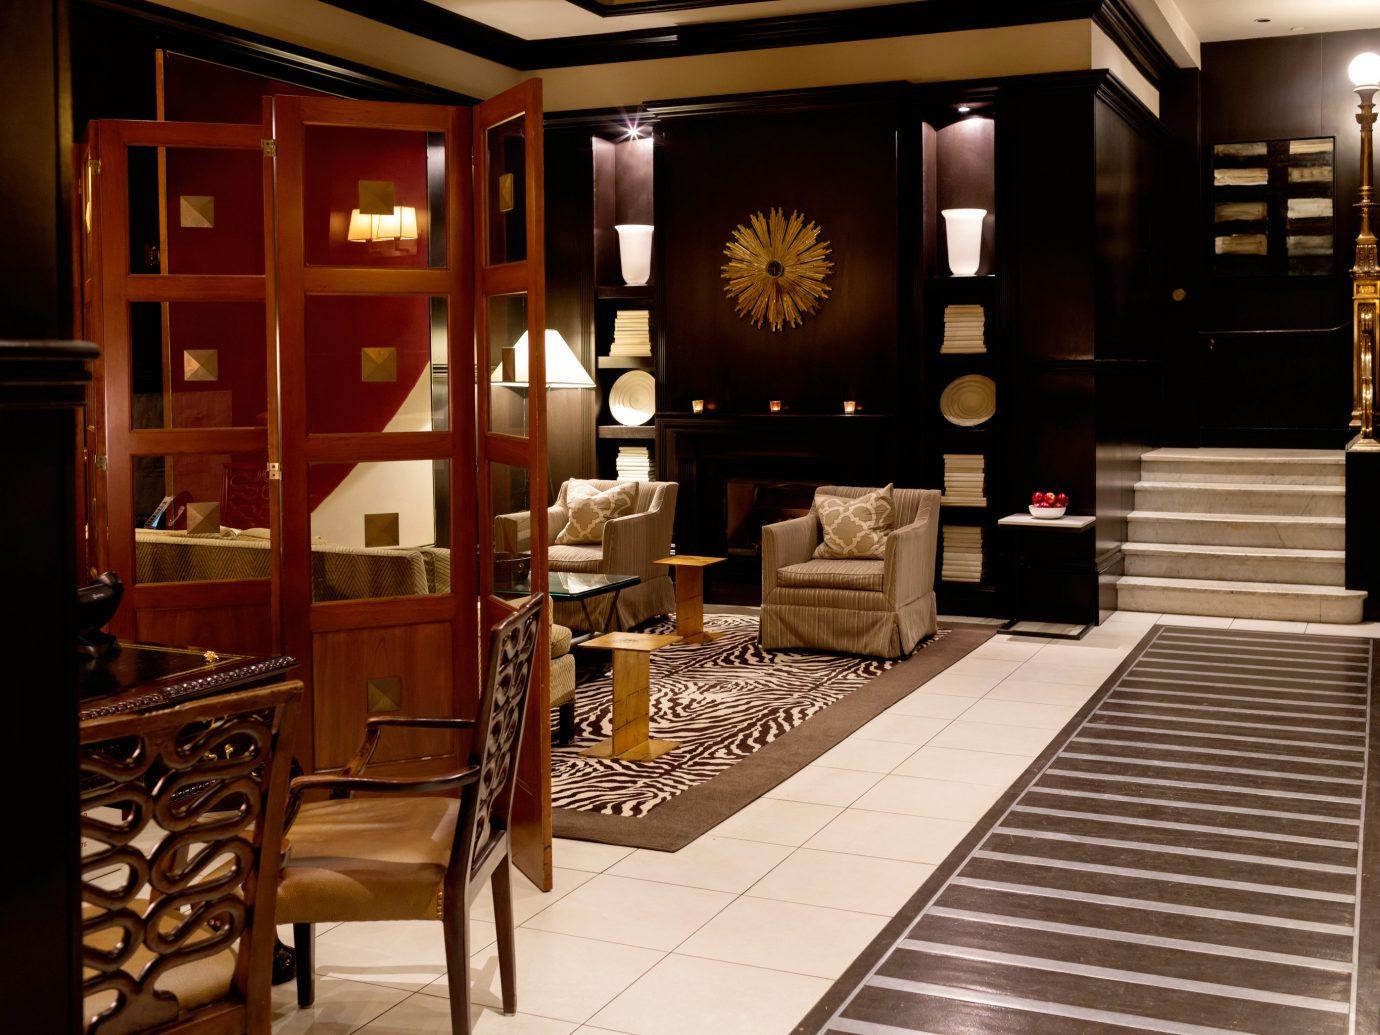 Hotels indoor room chair interior design floor dining room Lobby home lighting living room wood Design estate window covering Boutique furniture